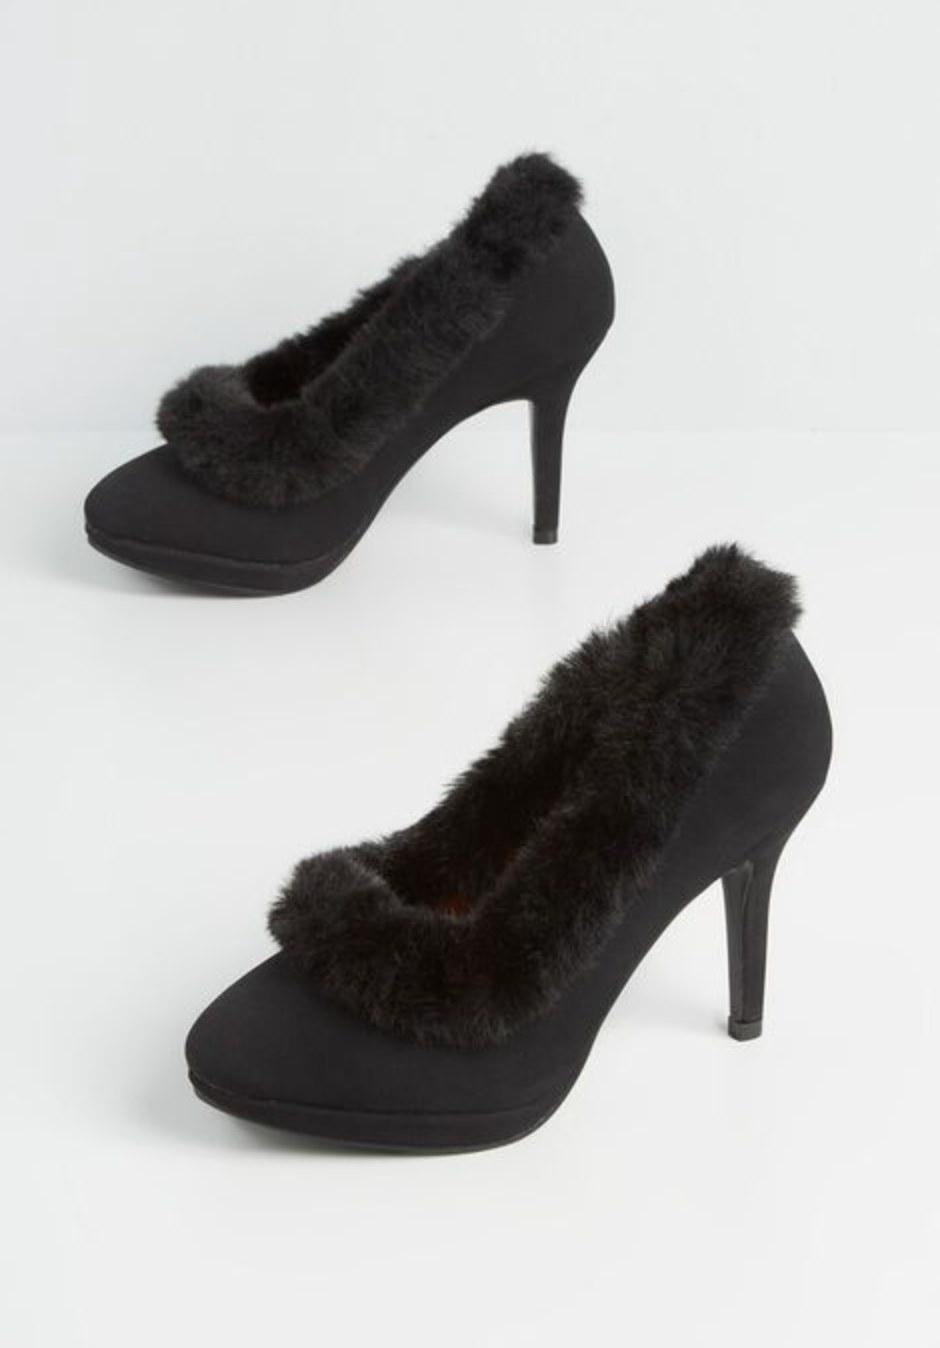 The heels in black